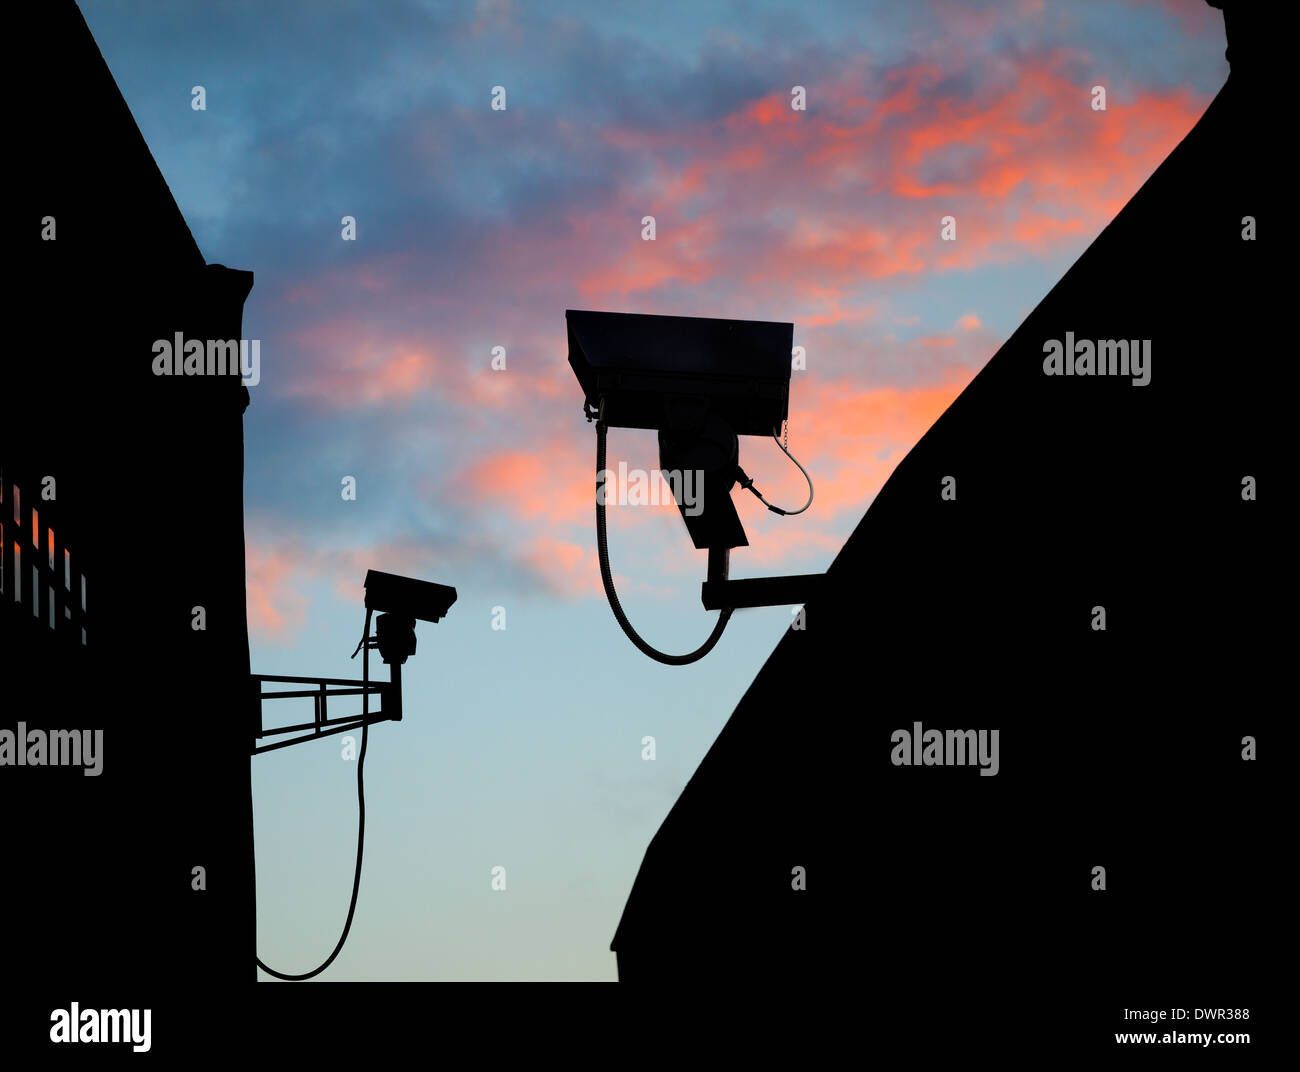 Security camera operating CCTV - Stock Image